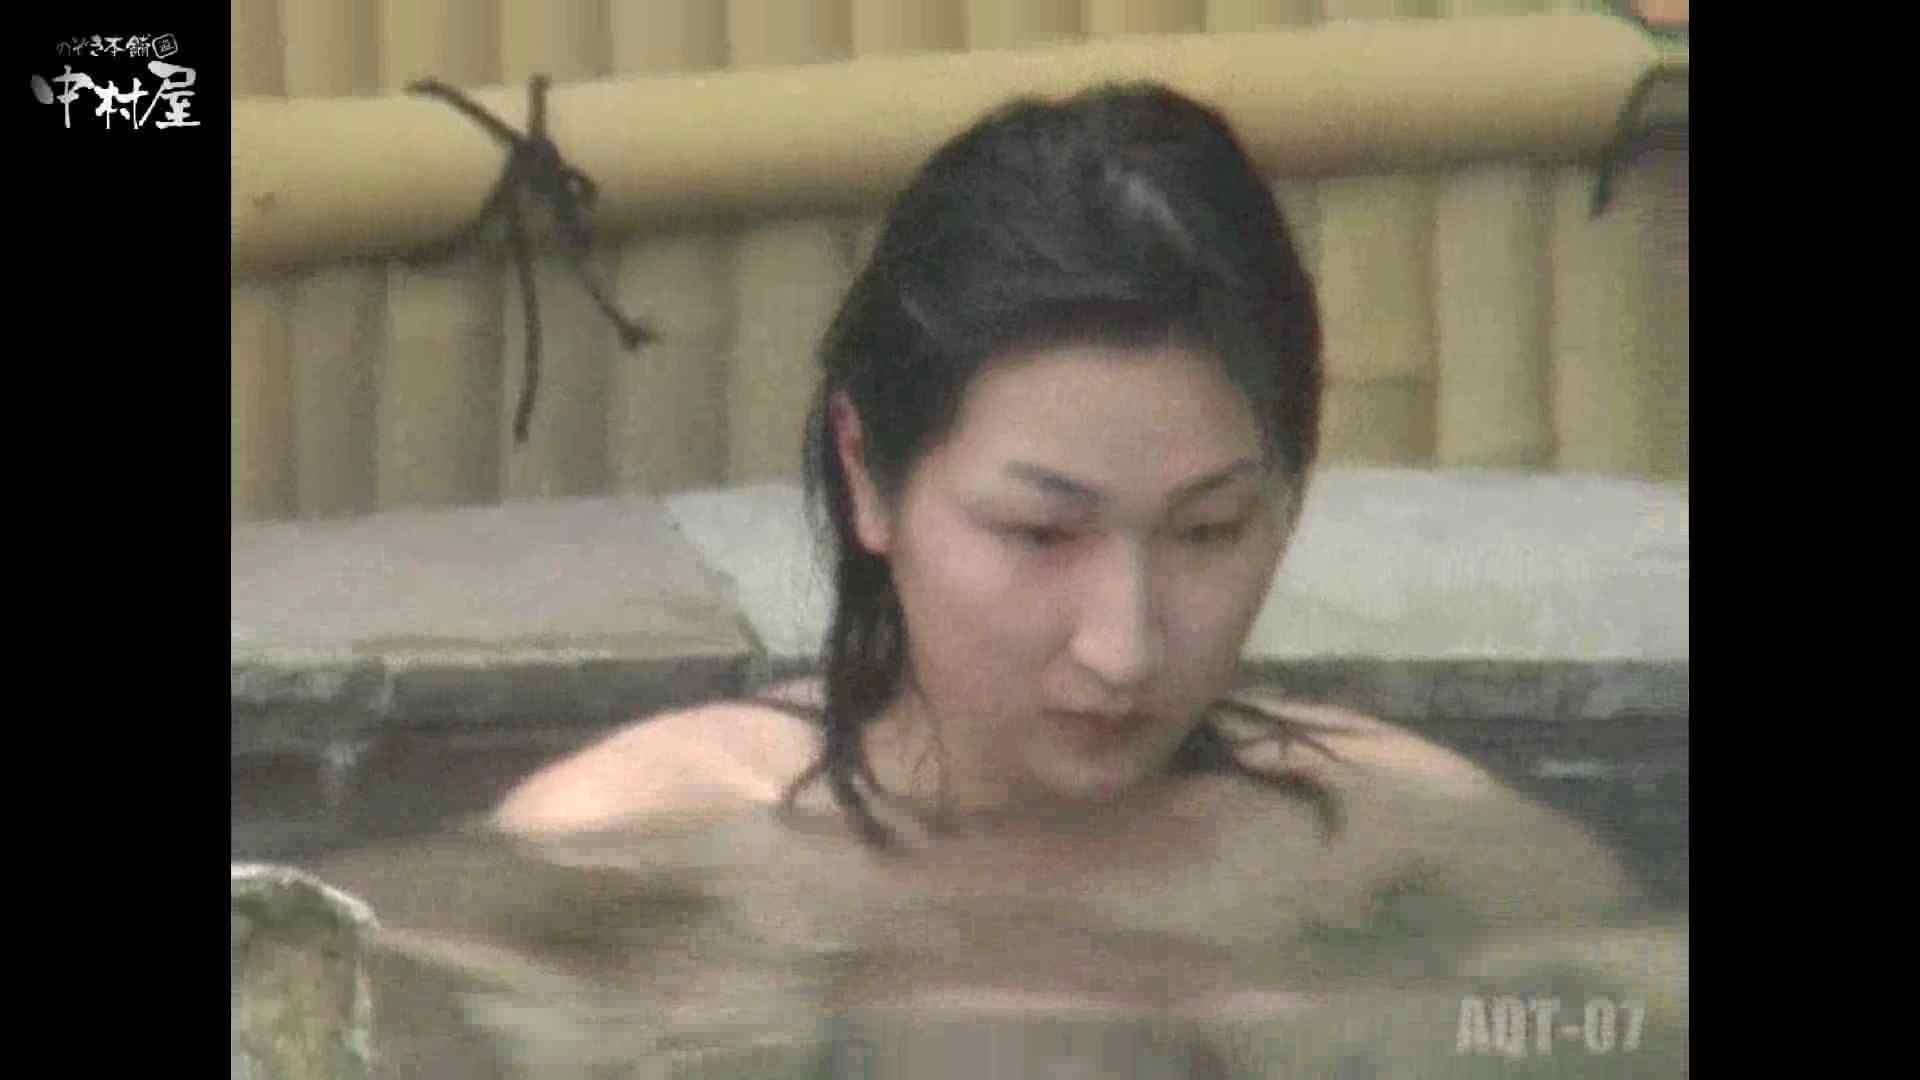 Aquaな露天風呂Vol.871潜入盗撮露天風呂七判湯 其の八 OLのプライベート エロ画像 12pic 2